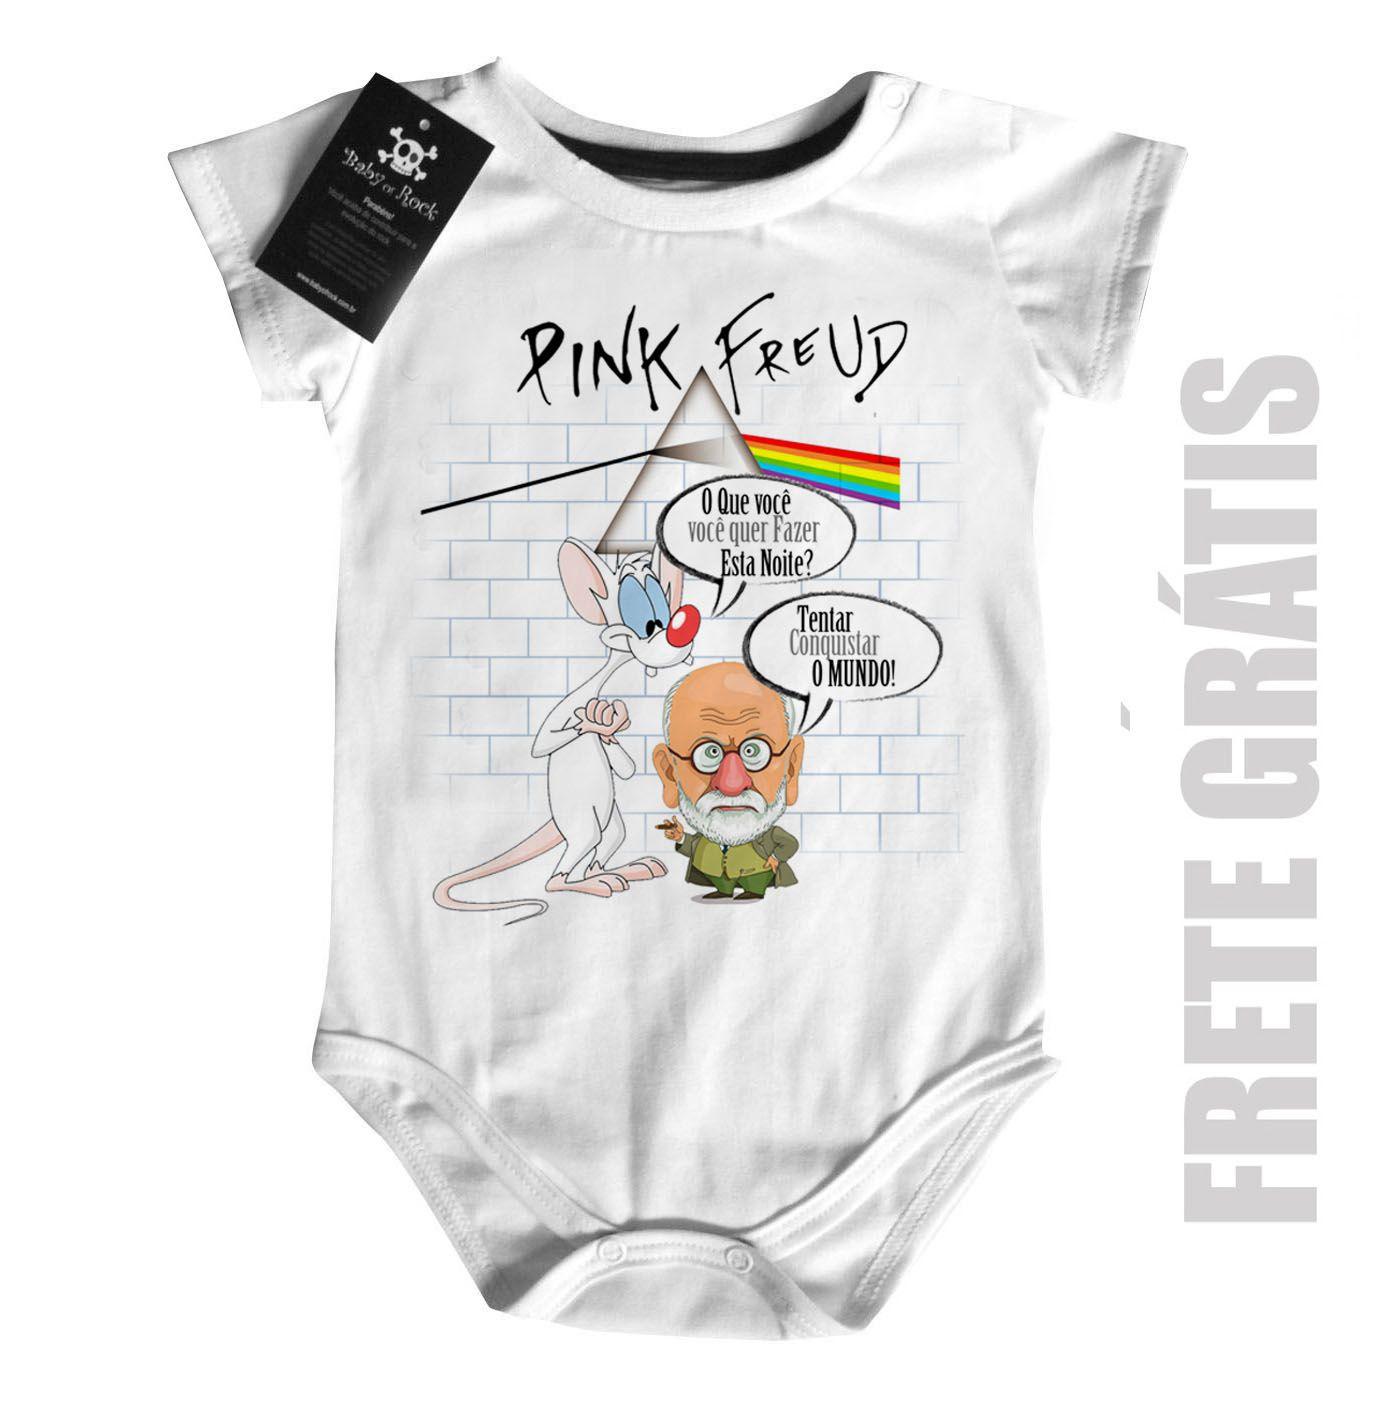 Body Rock  Bebê Pink e FREUD - Pink Floyd  - Baby Monster S/A